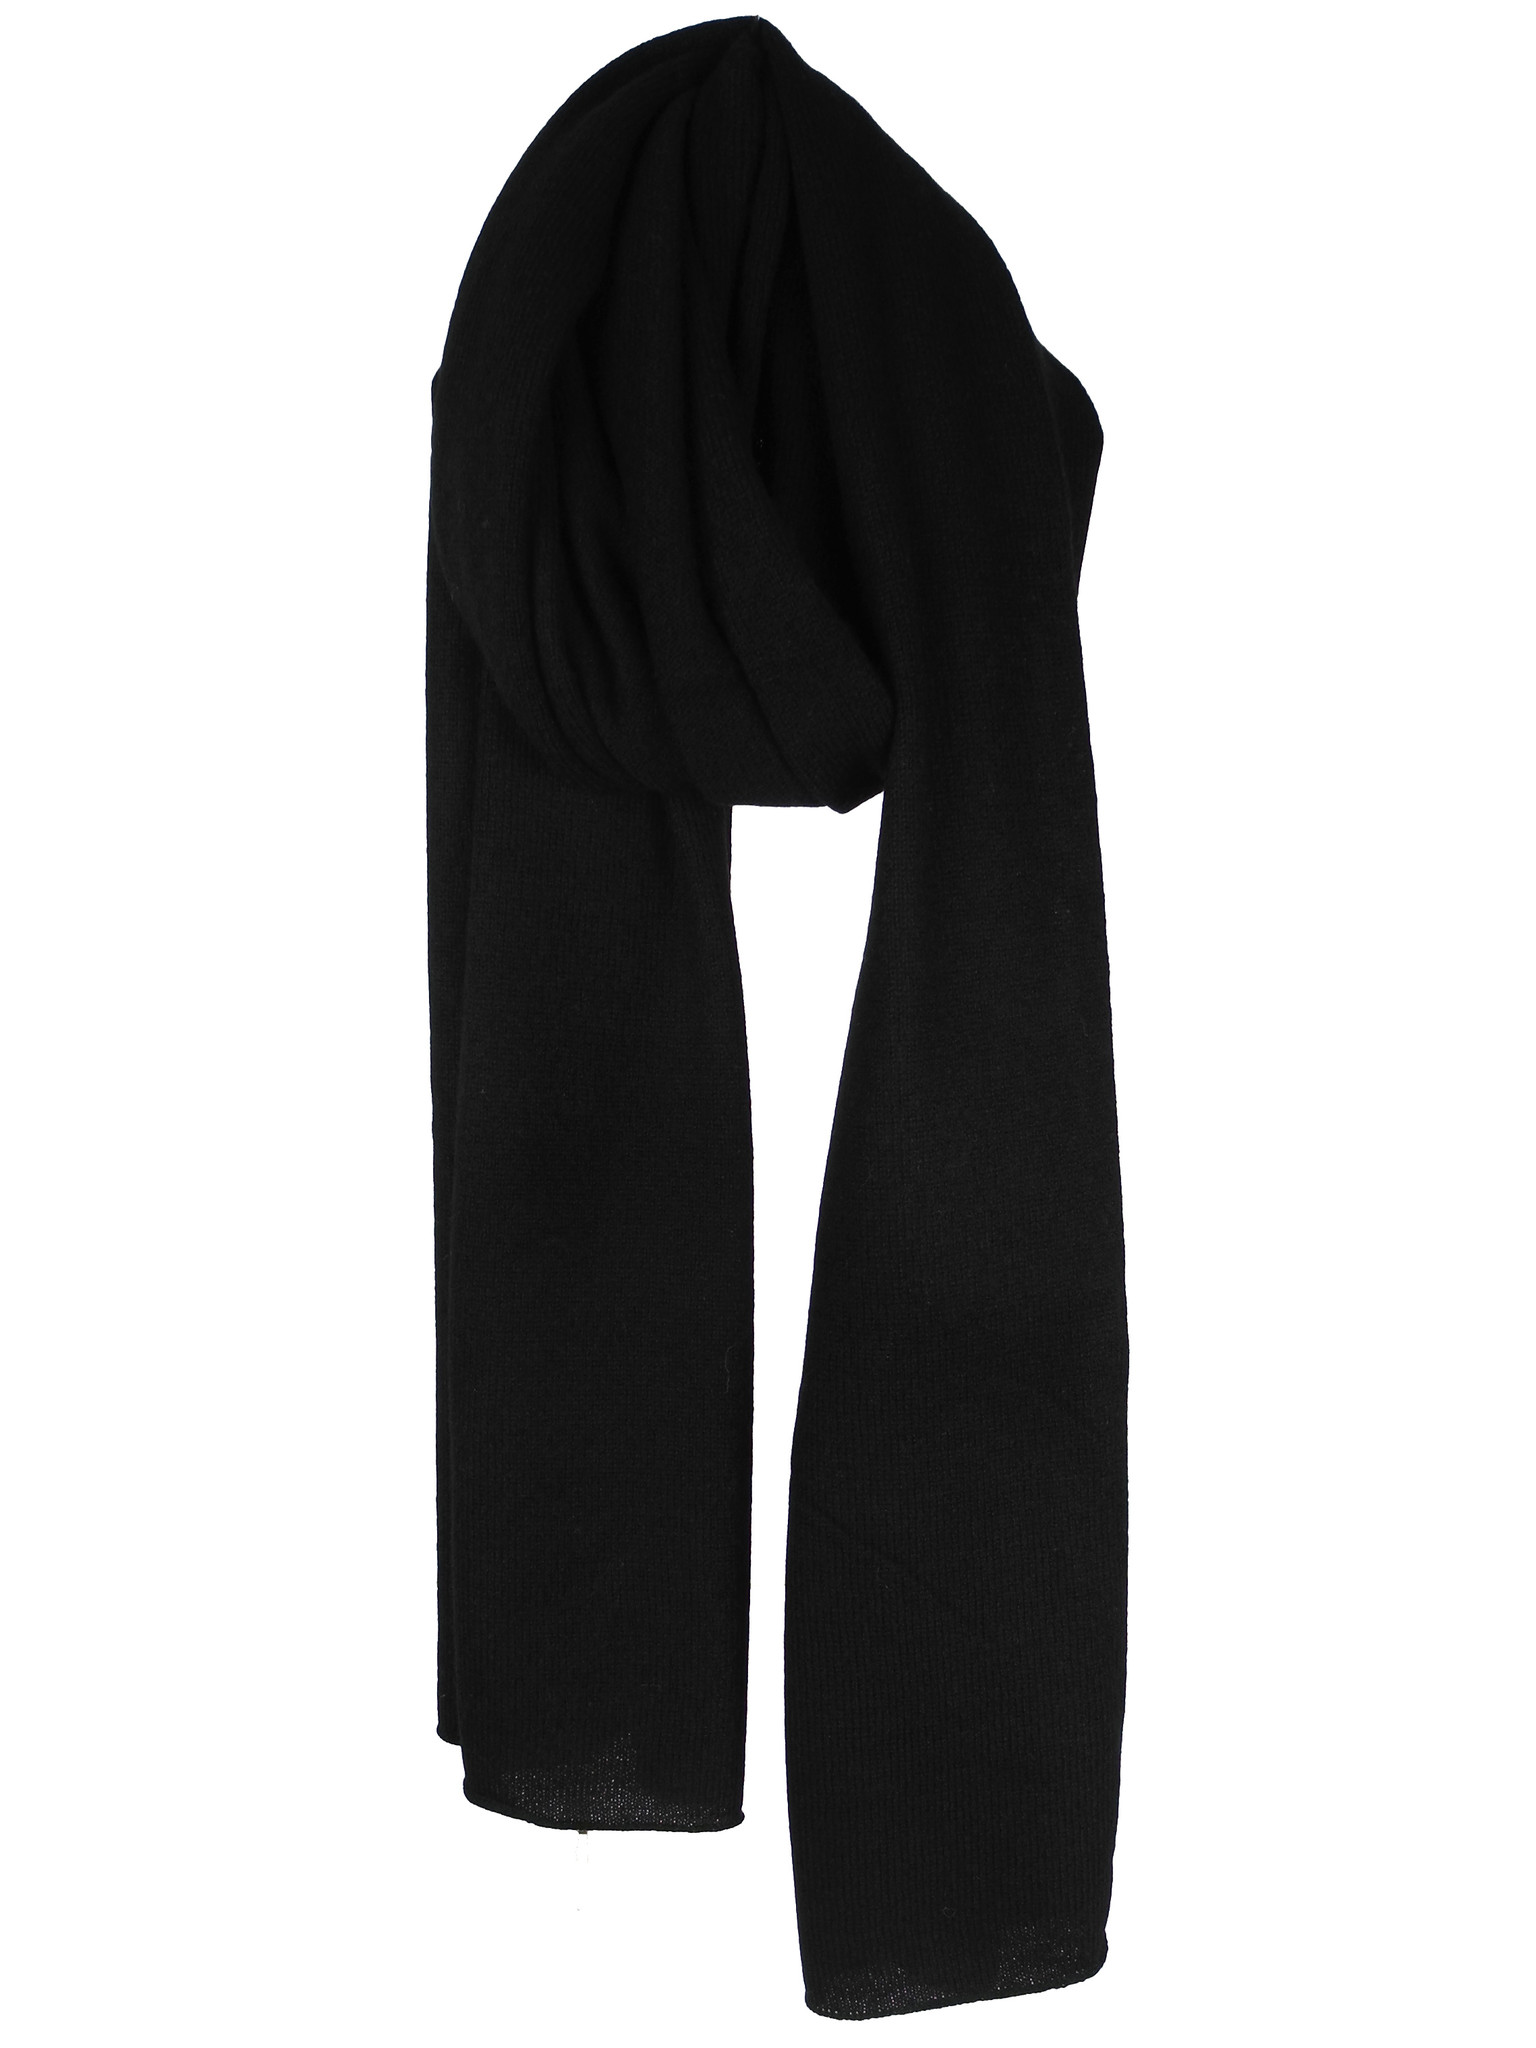 Sjaal SjaalMania Cosy 100% Cashmere Solid Black